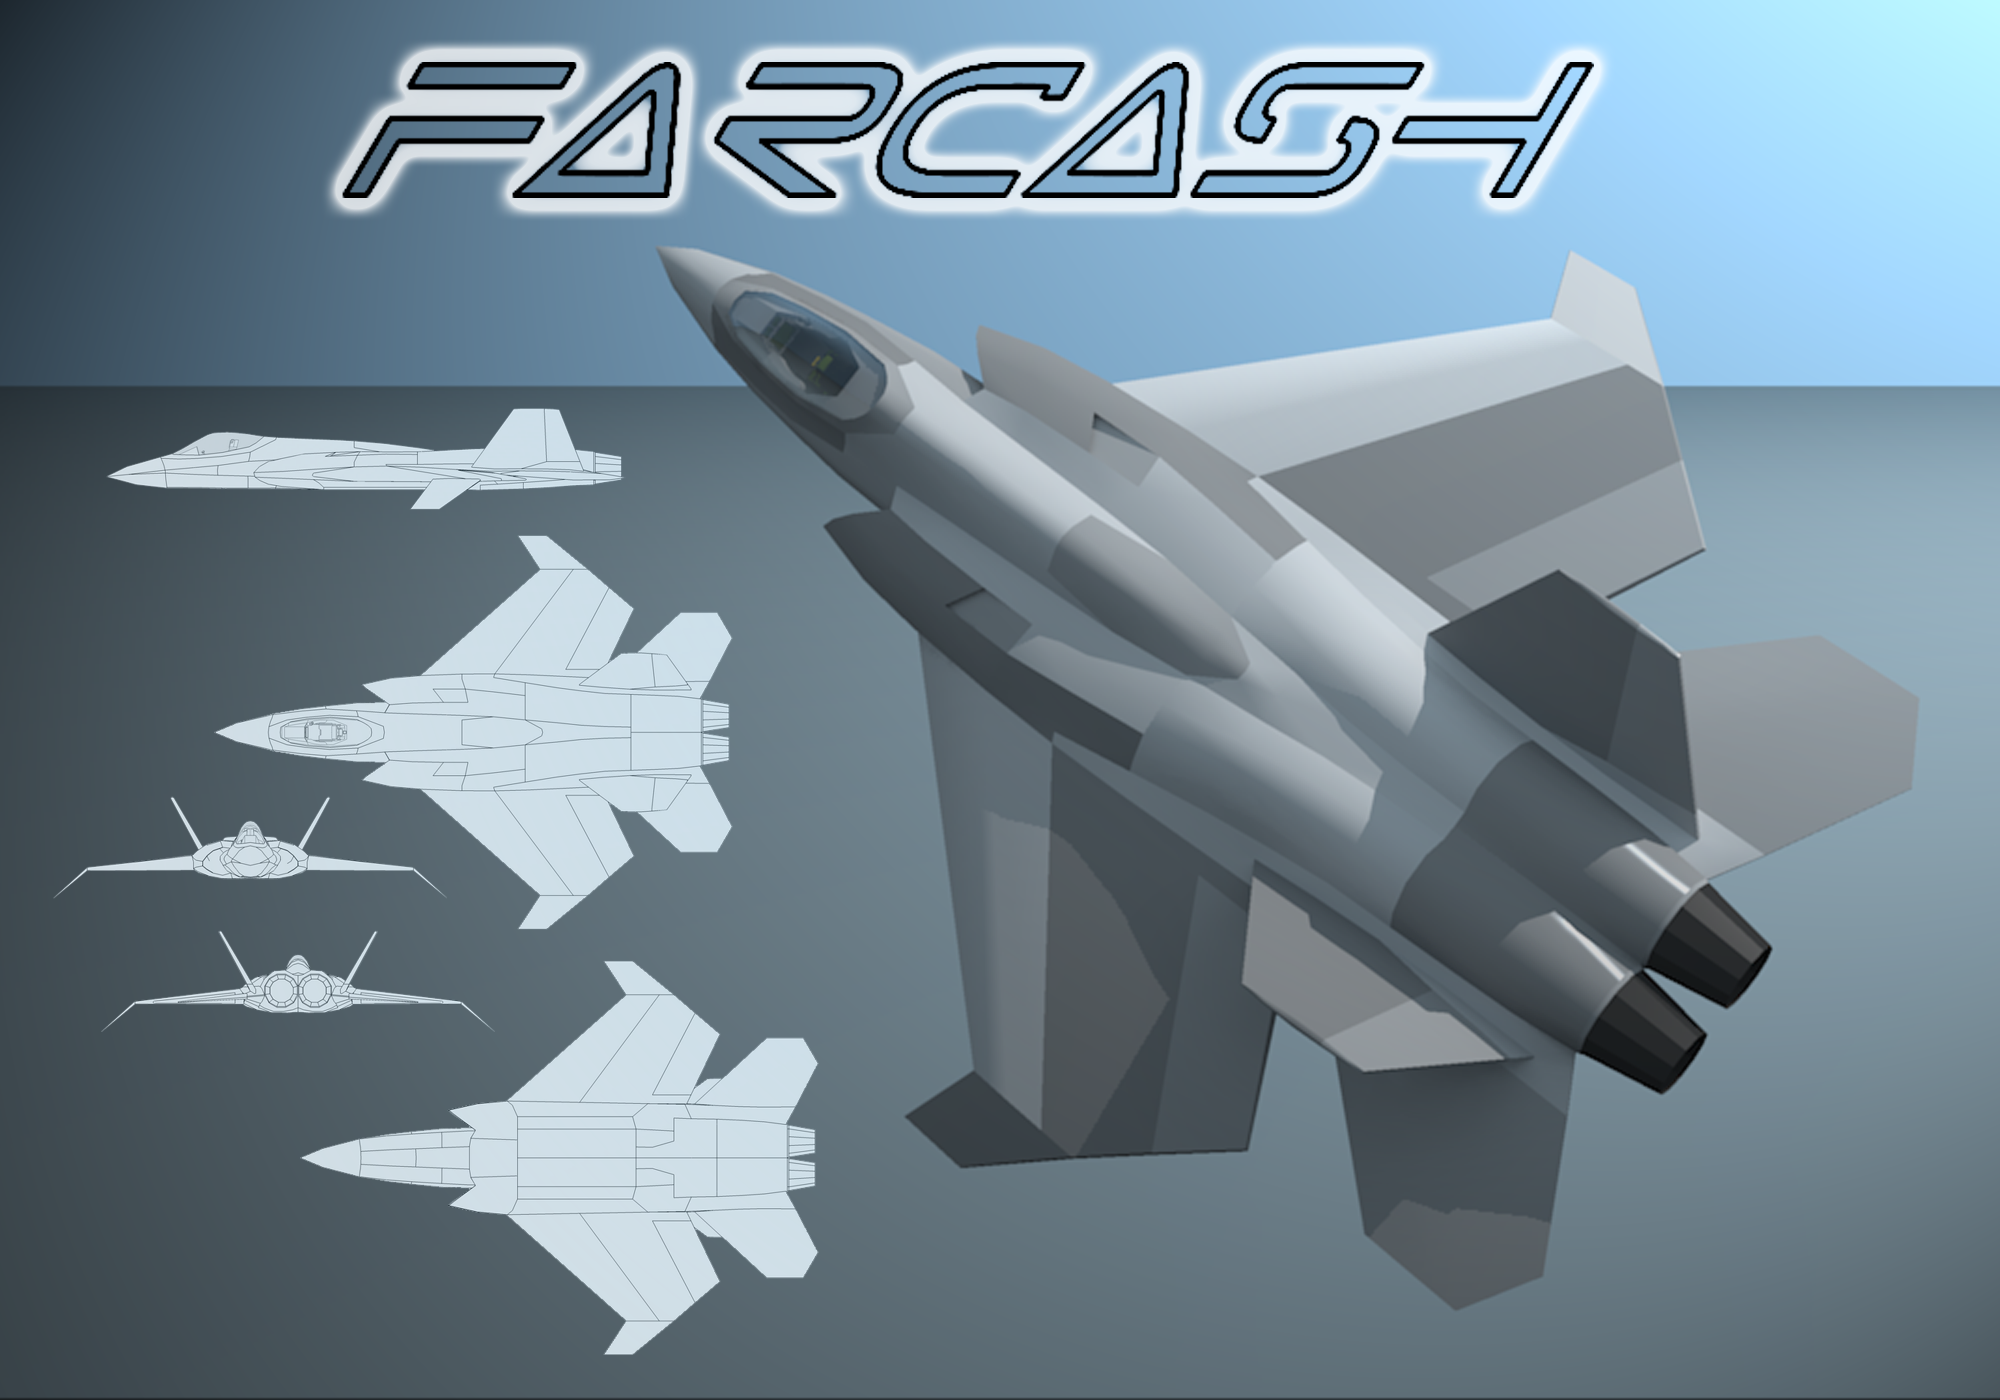 Da-37W Farcash by diasmon on DeviantArt